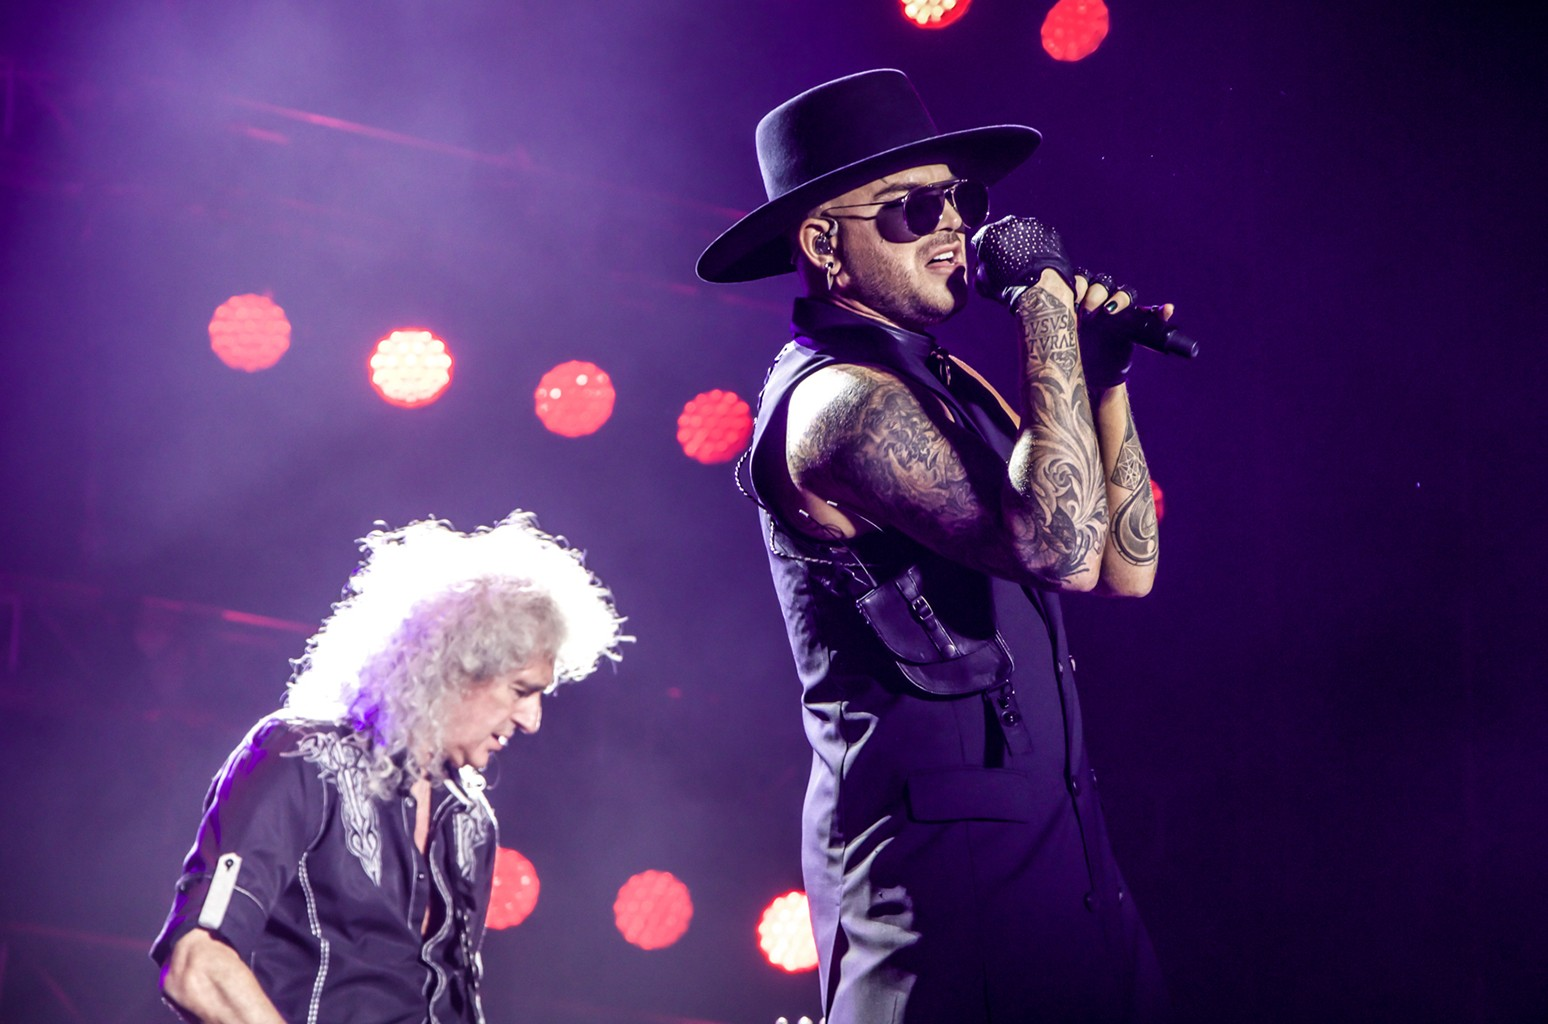 Queen and Adam Lambert perform in Tel Aviv's Park Hayarkon